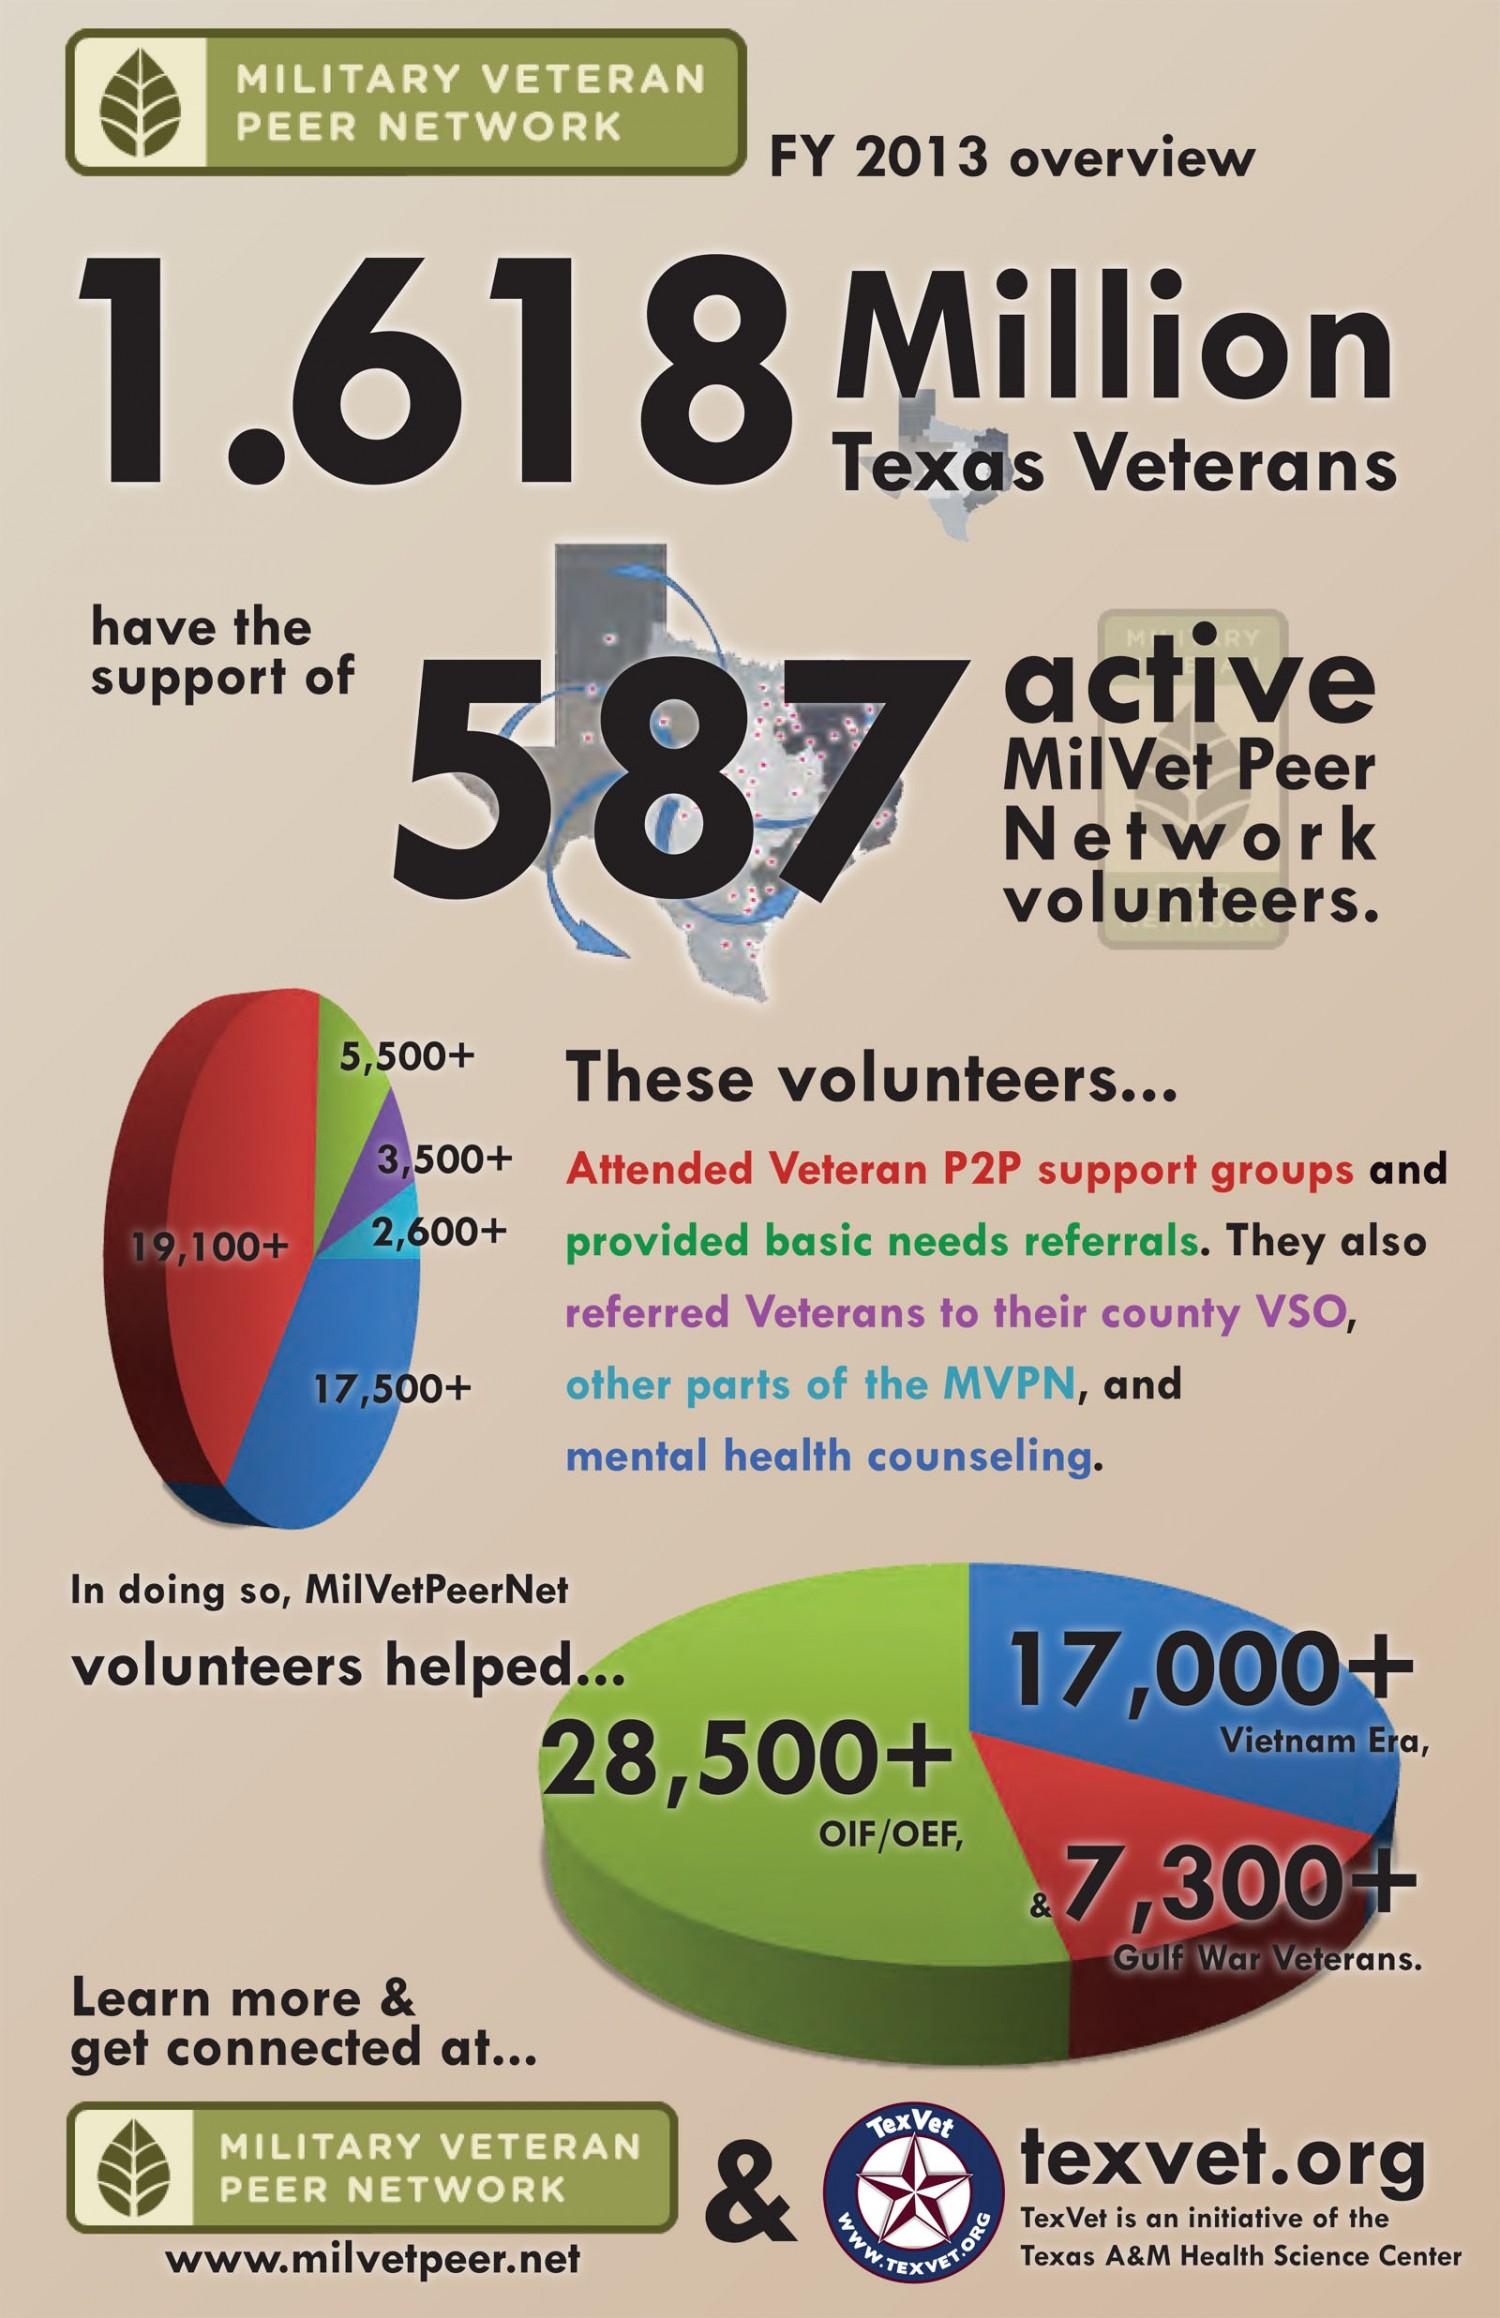 1. Military veteran peer network